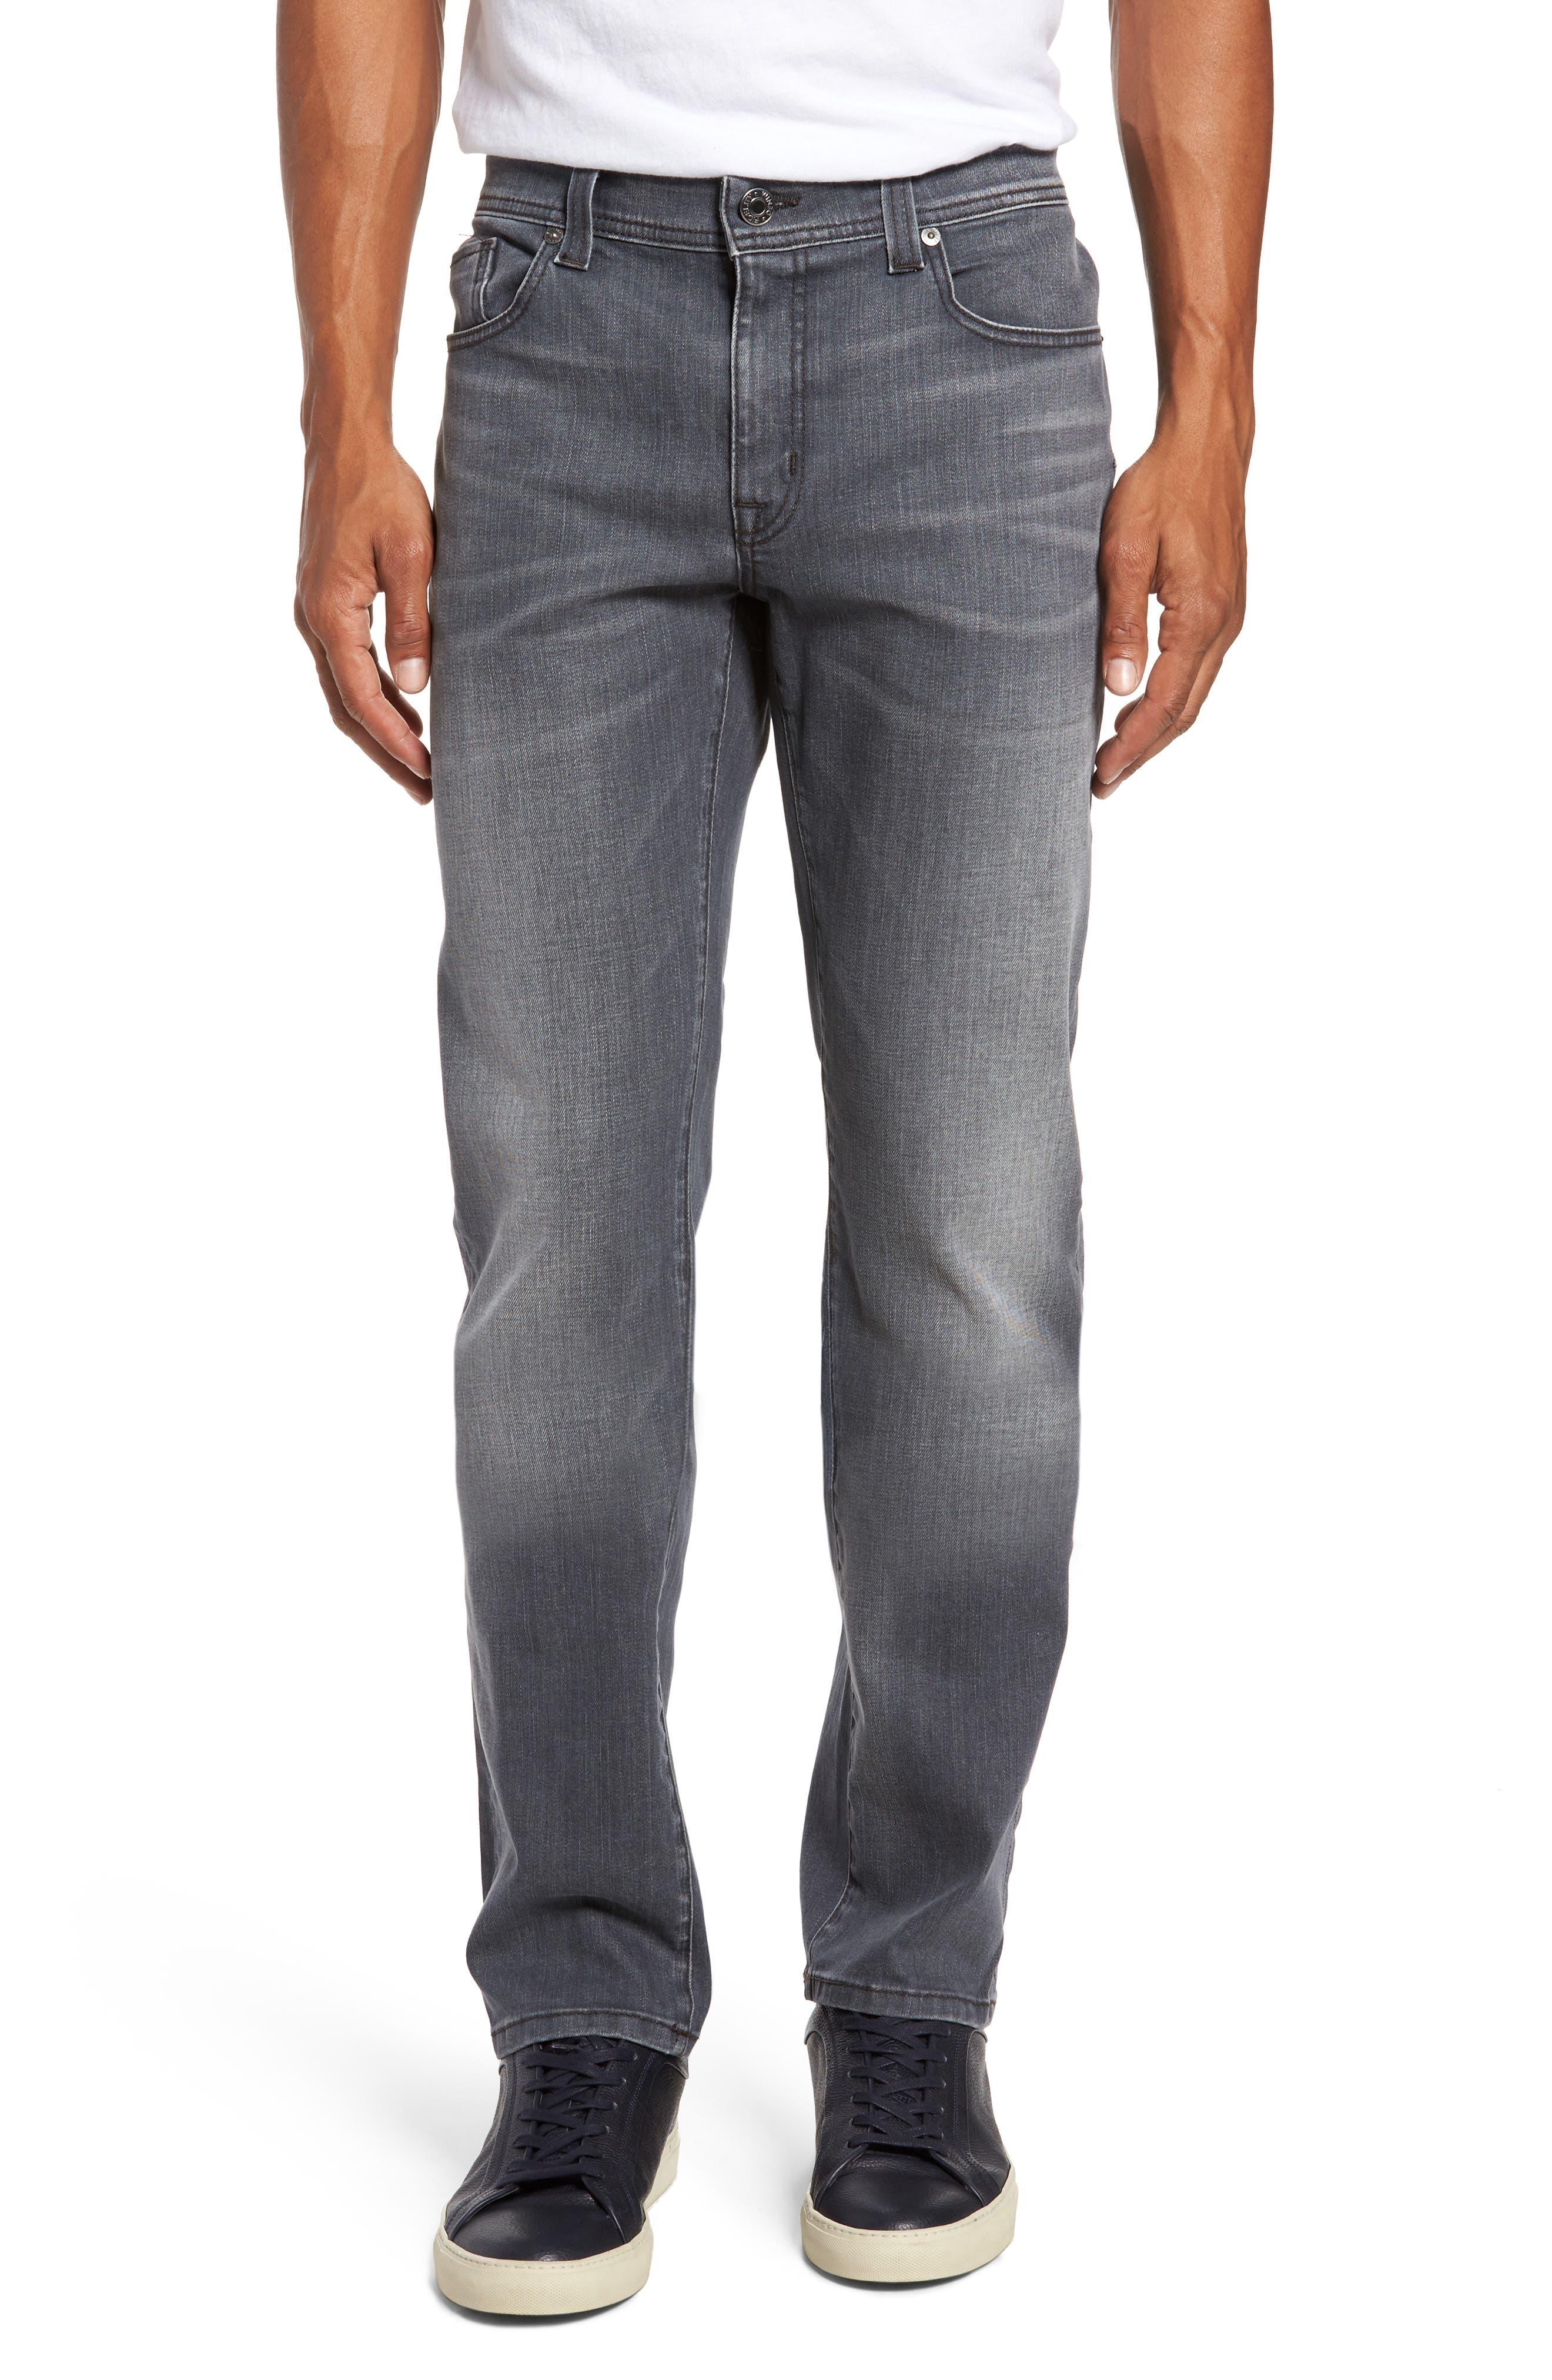 Main Image - Fidelity Denim Jimmy Slim Straight Fit Jeans (Steelo Vintage)